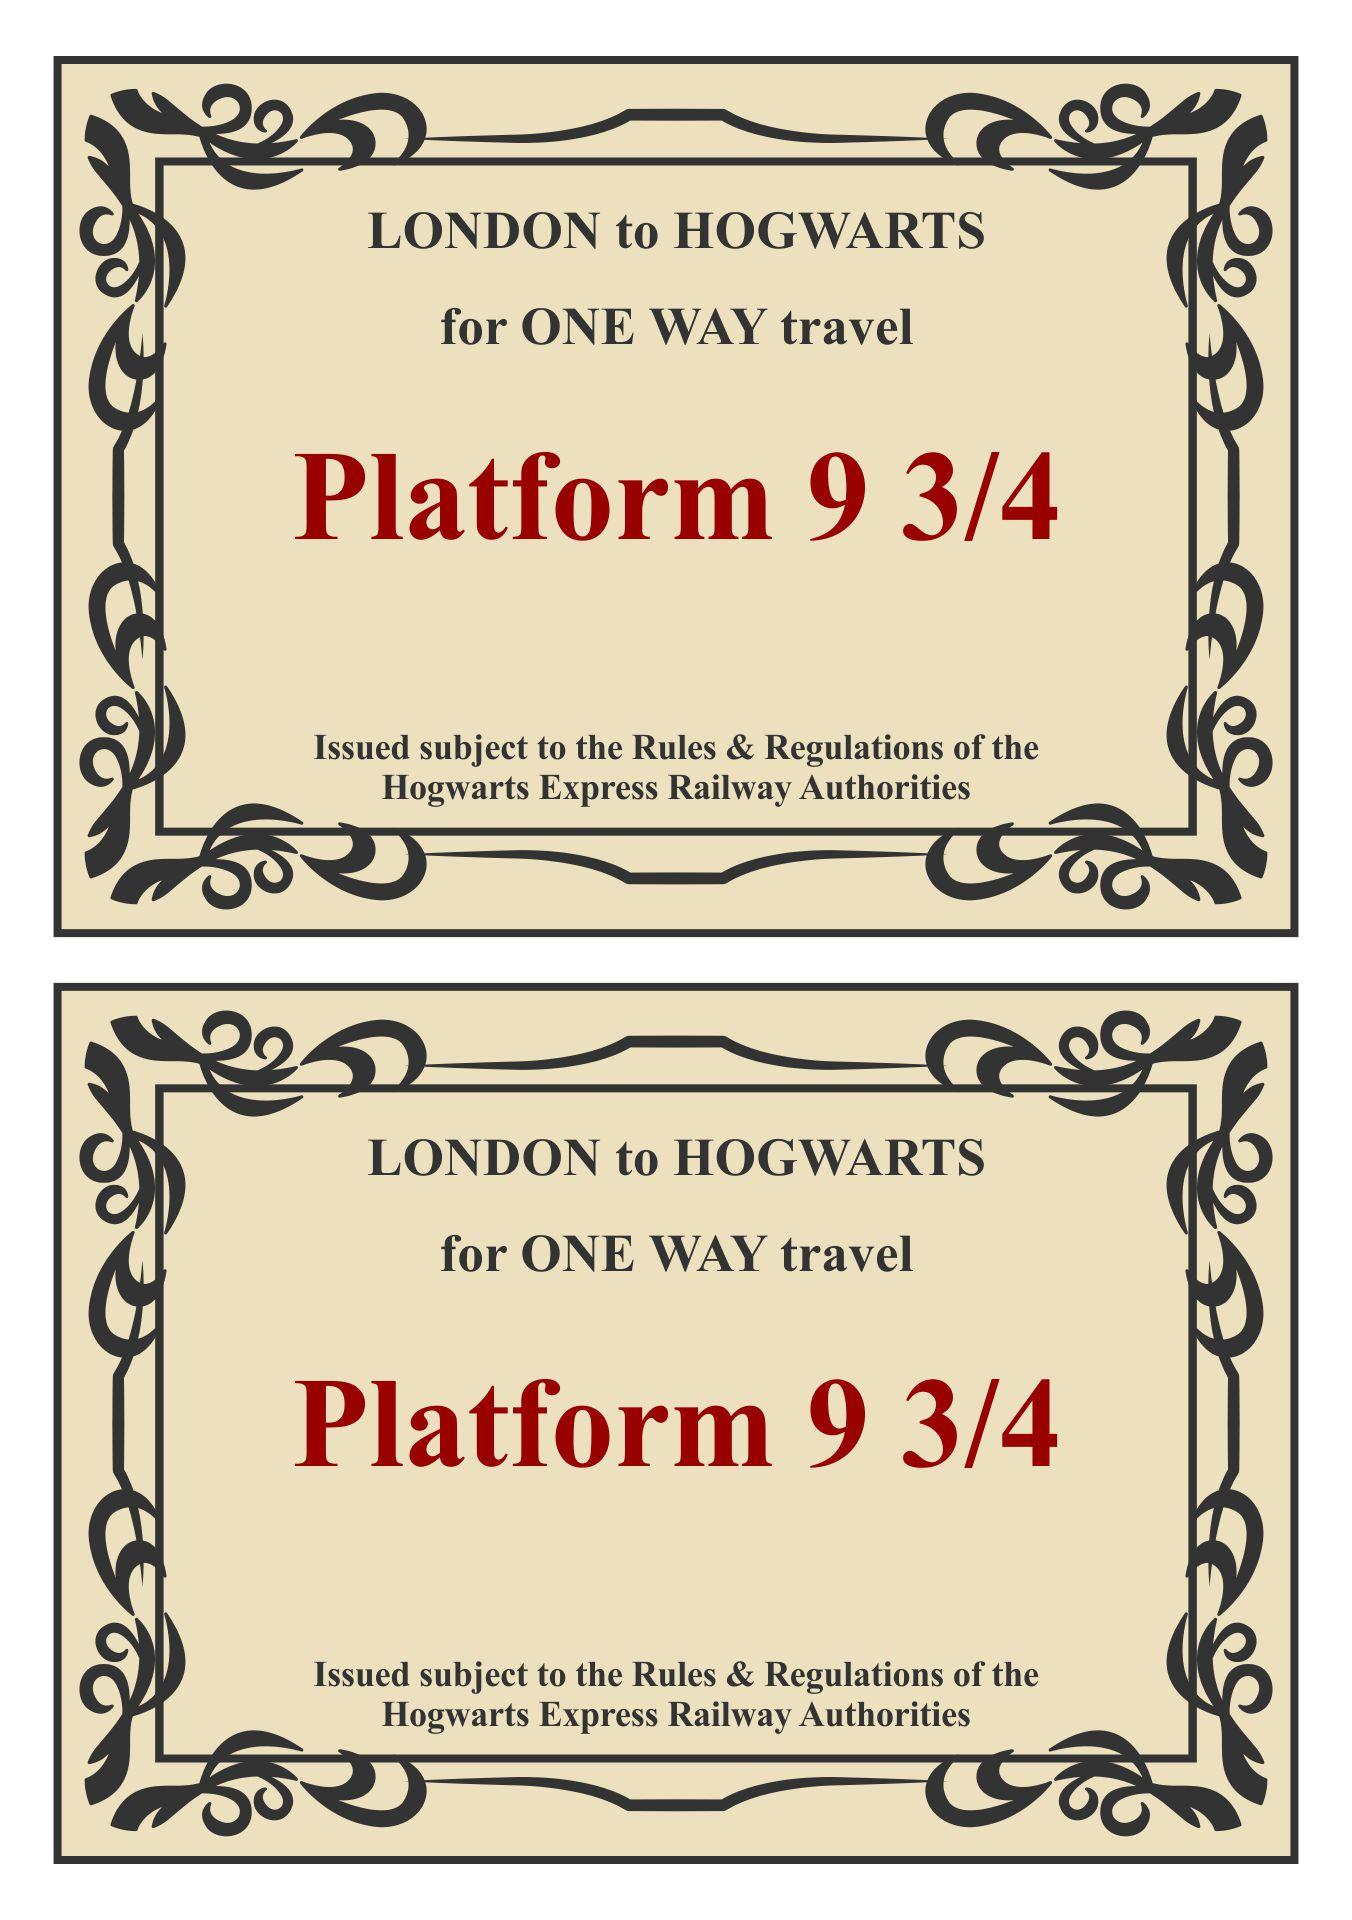 Harry Potter Hogwarts Express Train Ticket